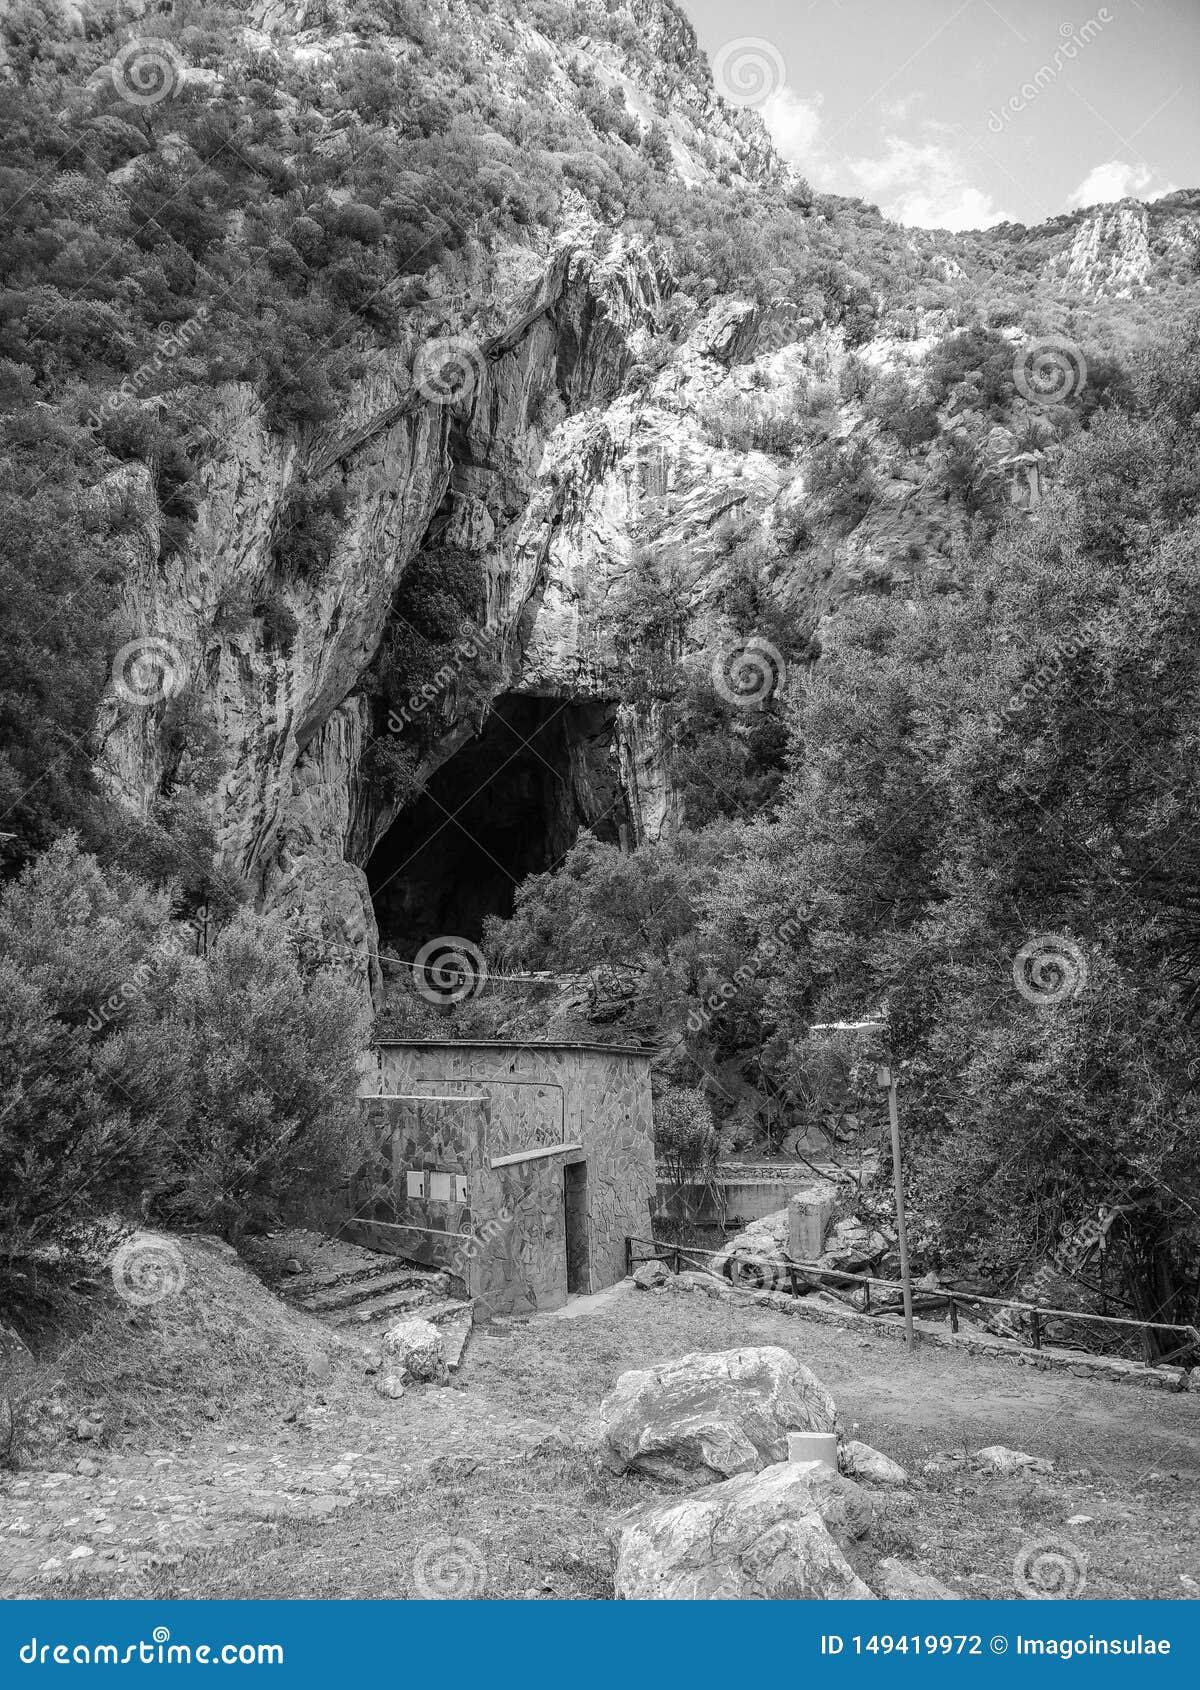 Sardinia. Natural monuments. Caves of San Giovanni, near Domusnovas in Iglesiente region. Southern entrance